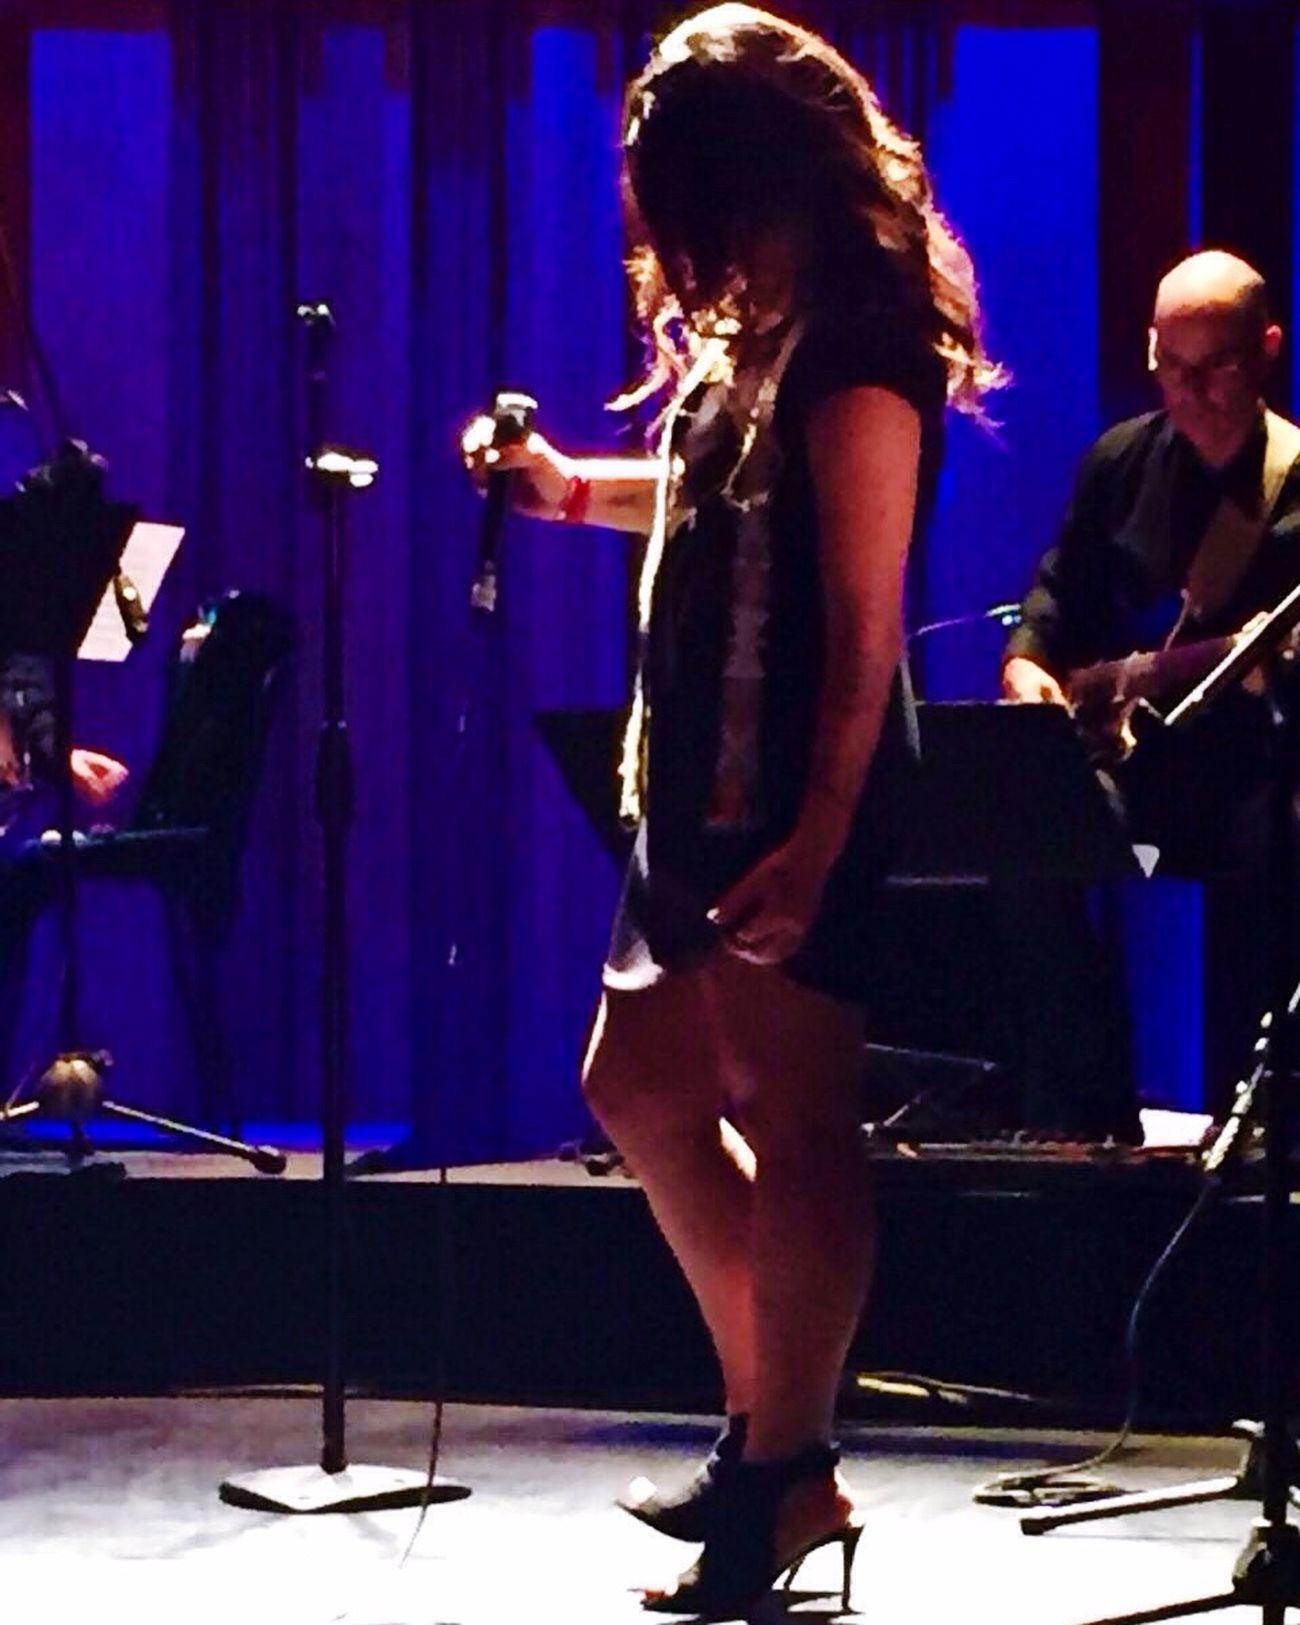 Concierto acústico de la gran cantante Chile AnitaTijoux Concert Photography Acustic  Lovemusic Georgous Poderfeminino Santiago De Chile Singer/Song Writer Rap&hiphop Acustico Eyemphotography Thebest Musicismypassion